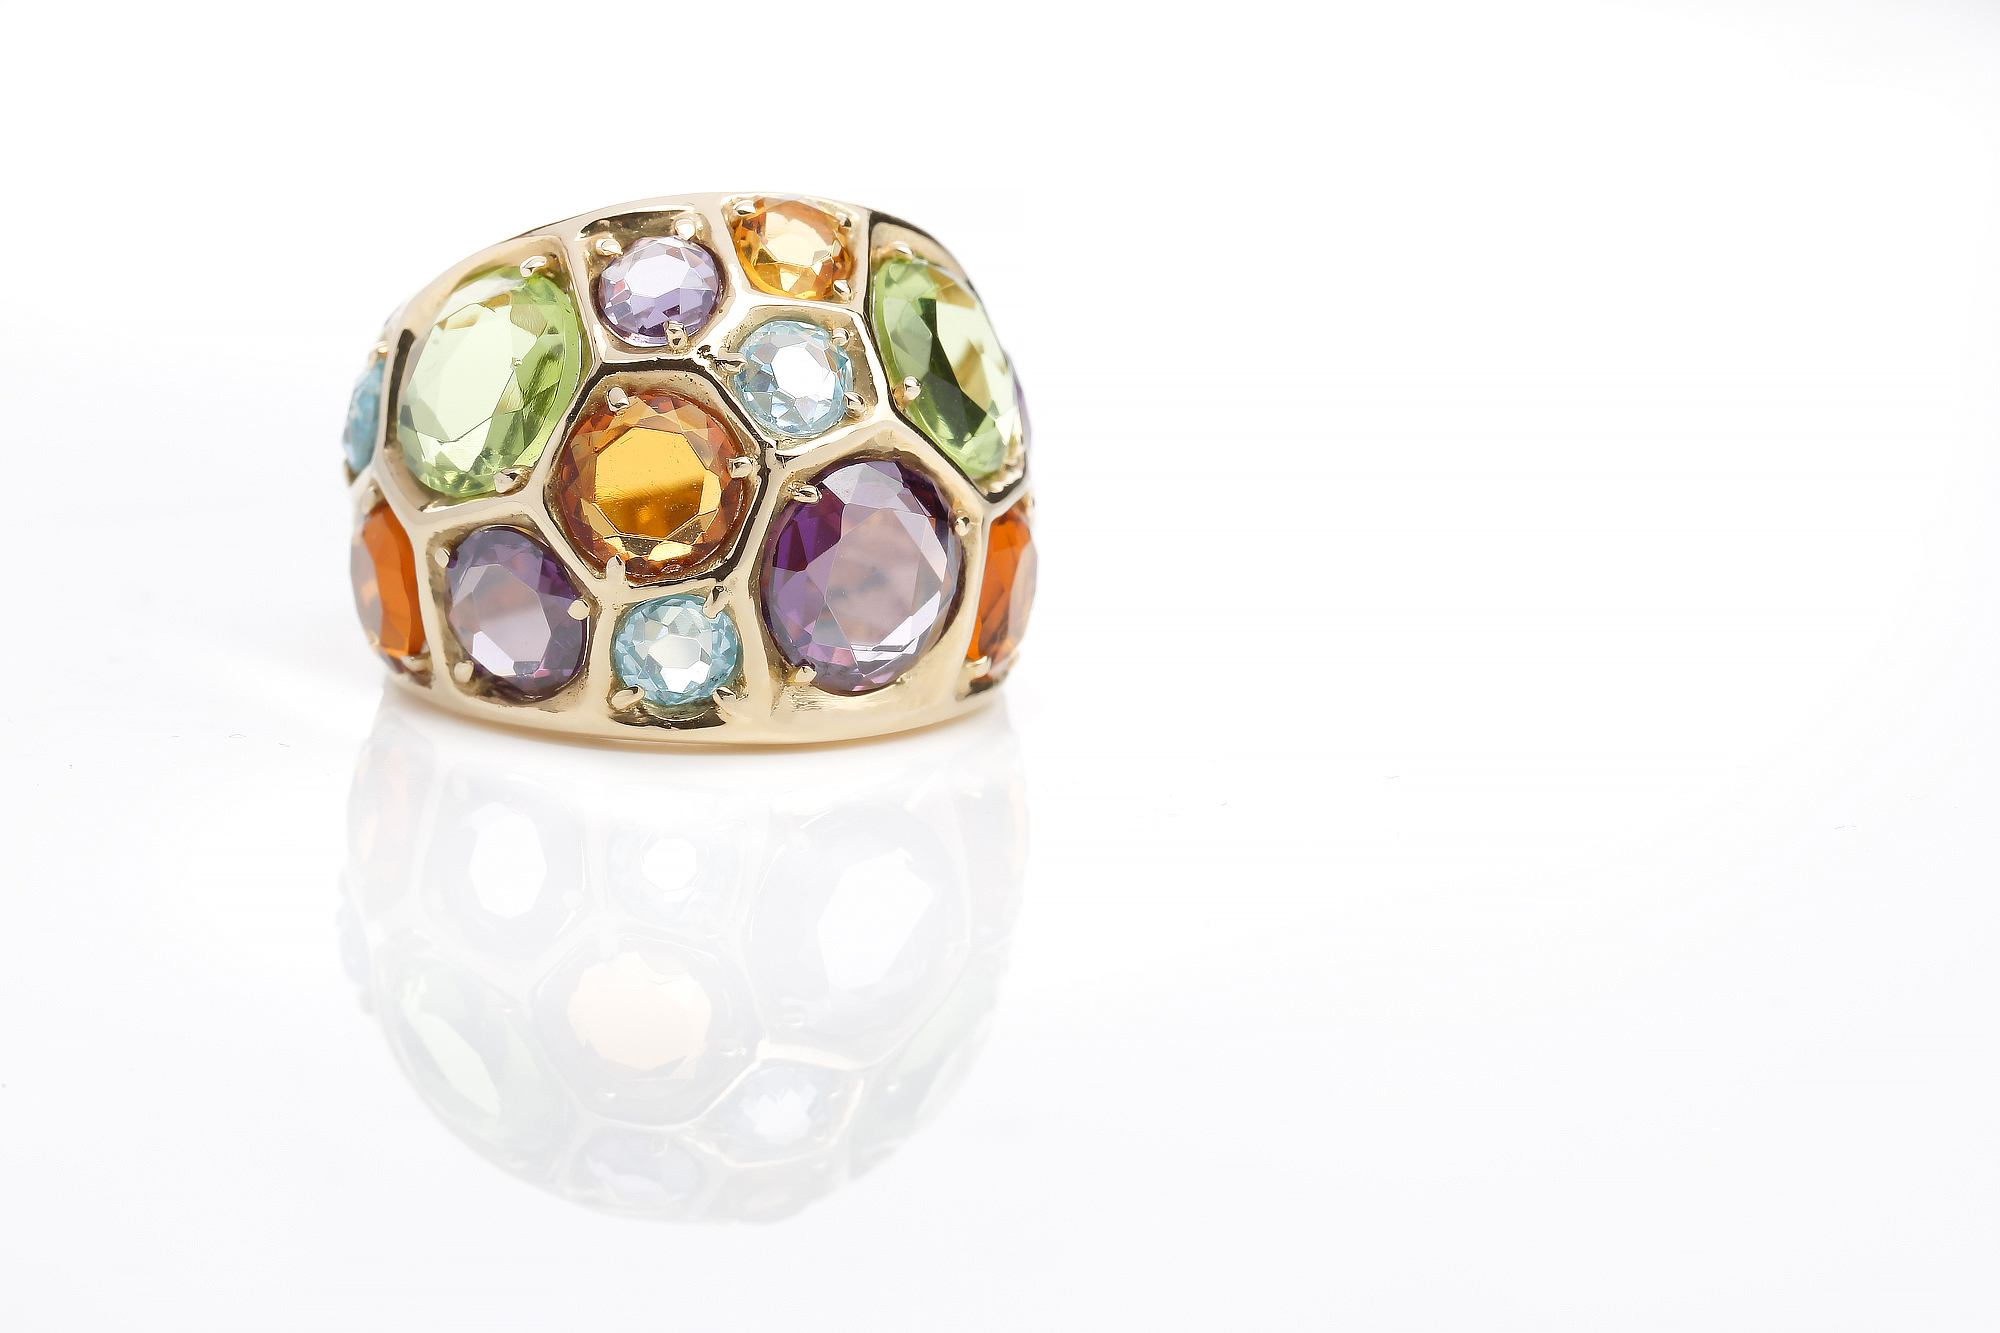 Parrini Gioielli - Ring stones